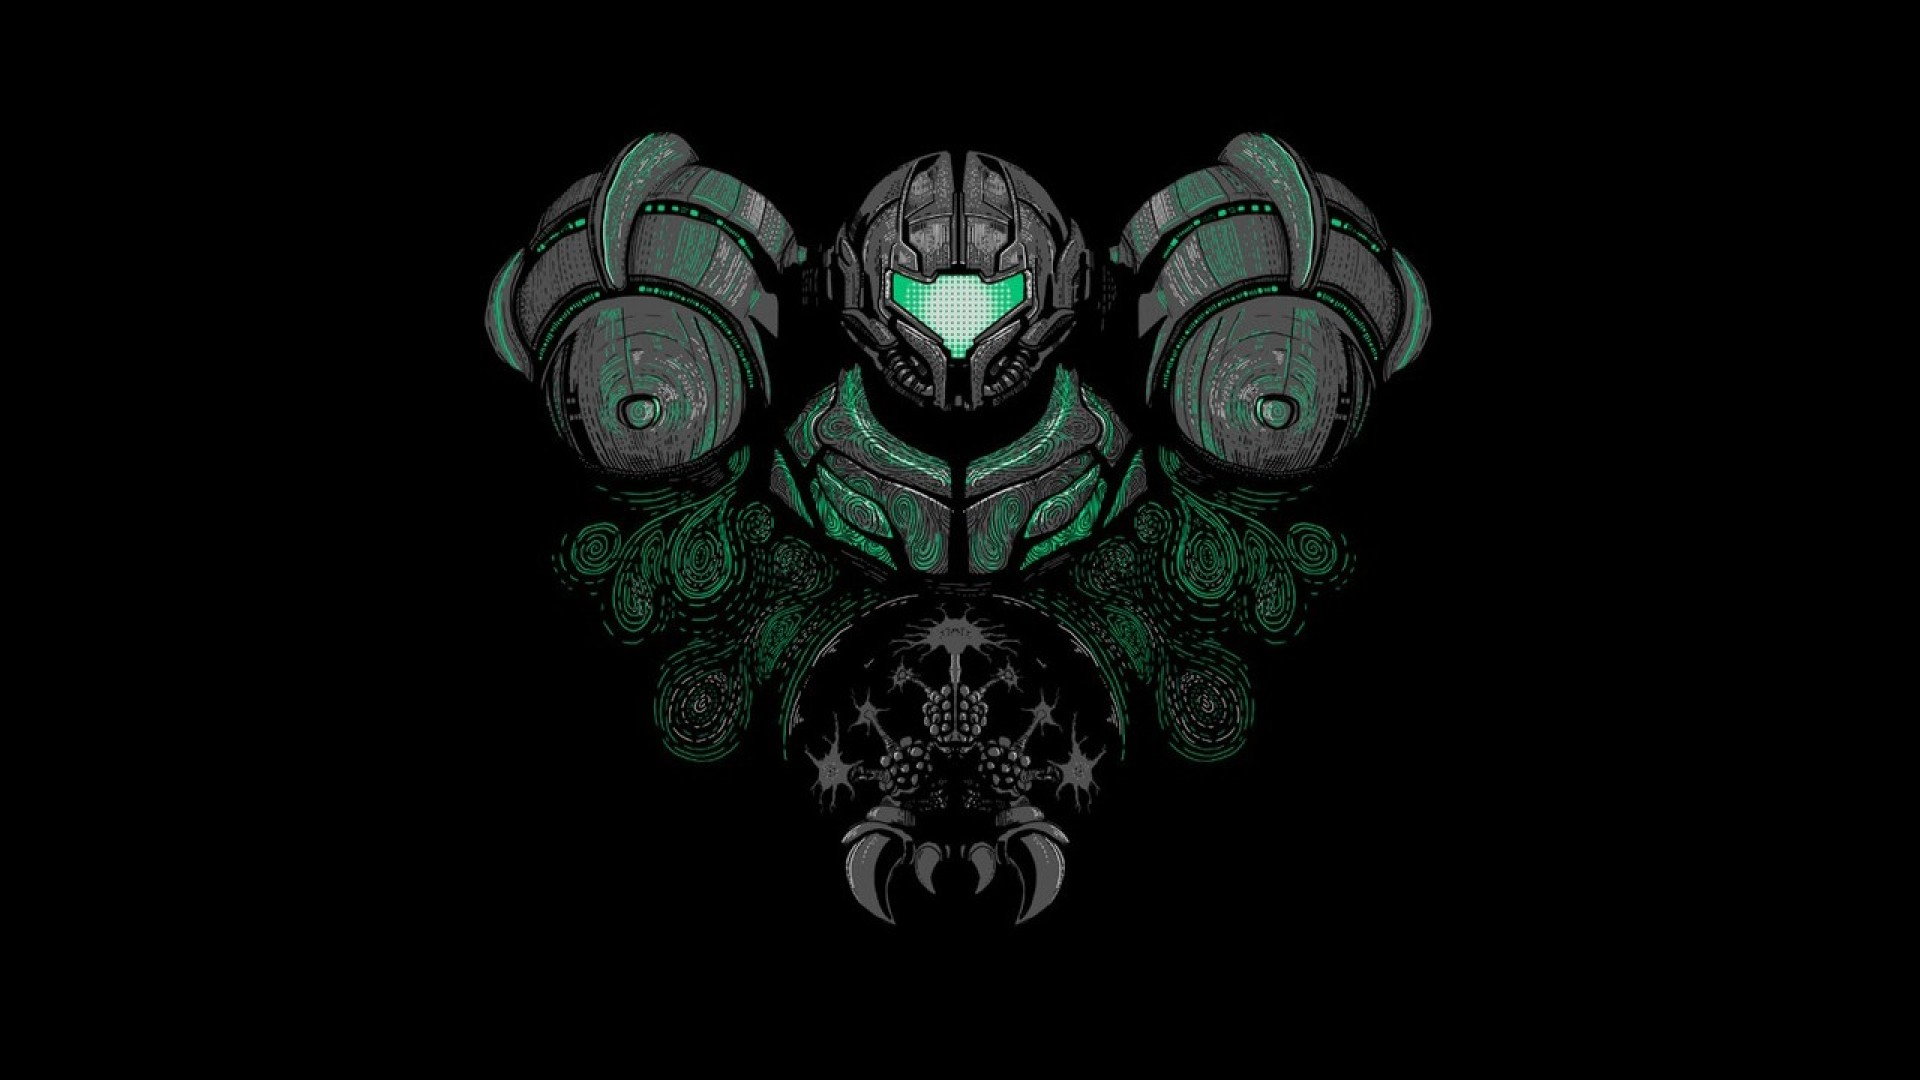 Metroid stylized wallpaper